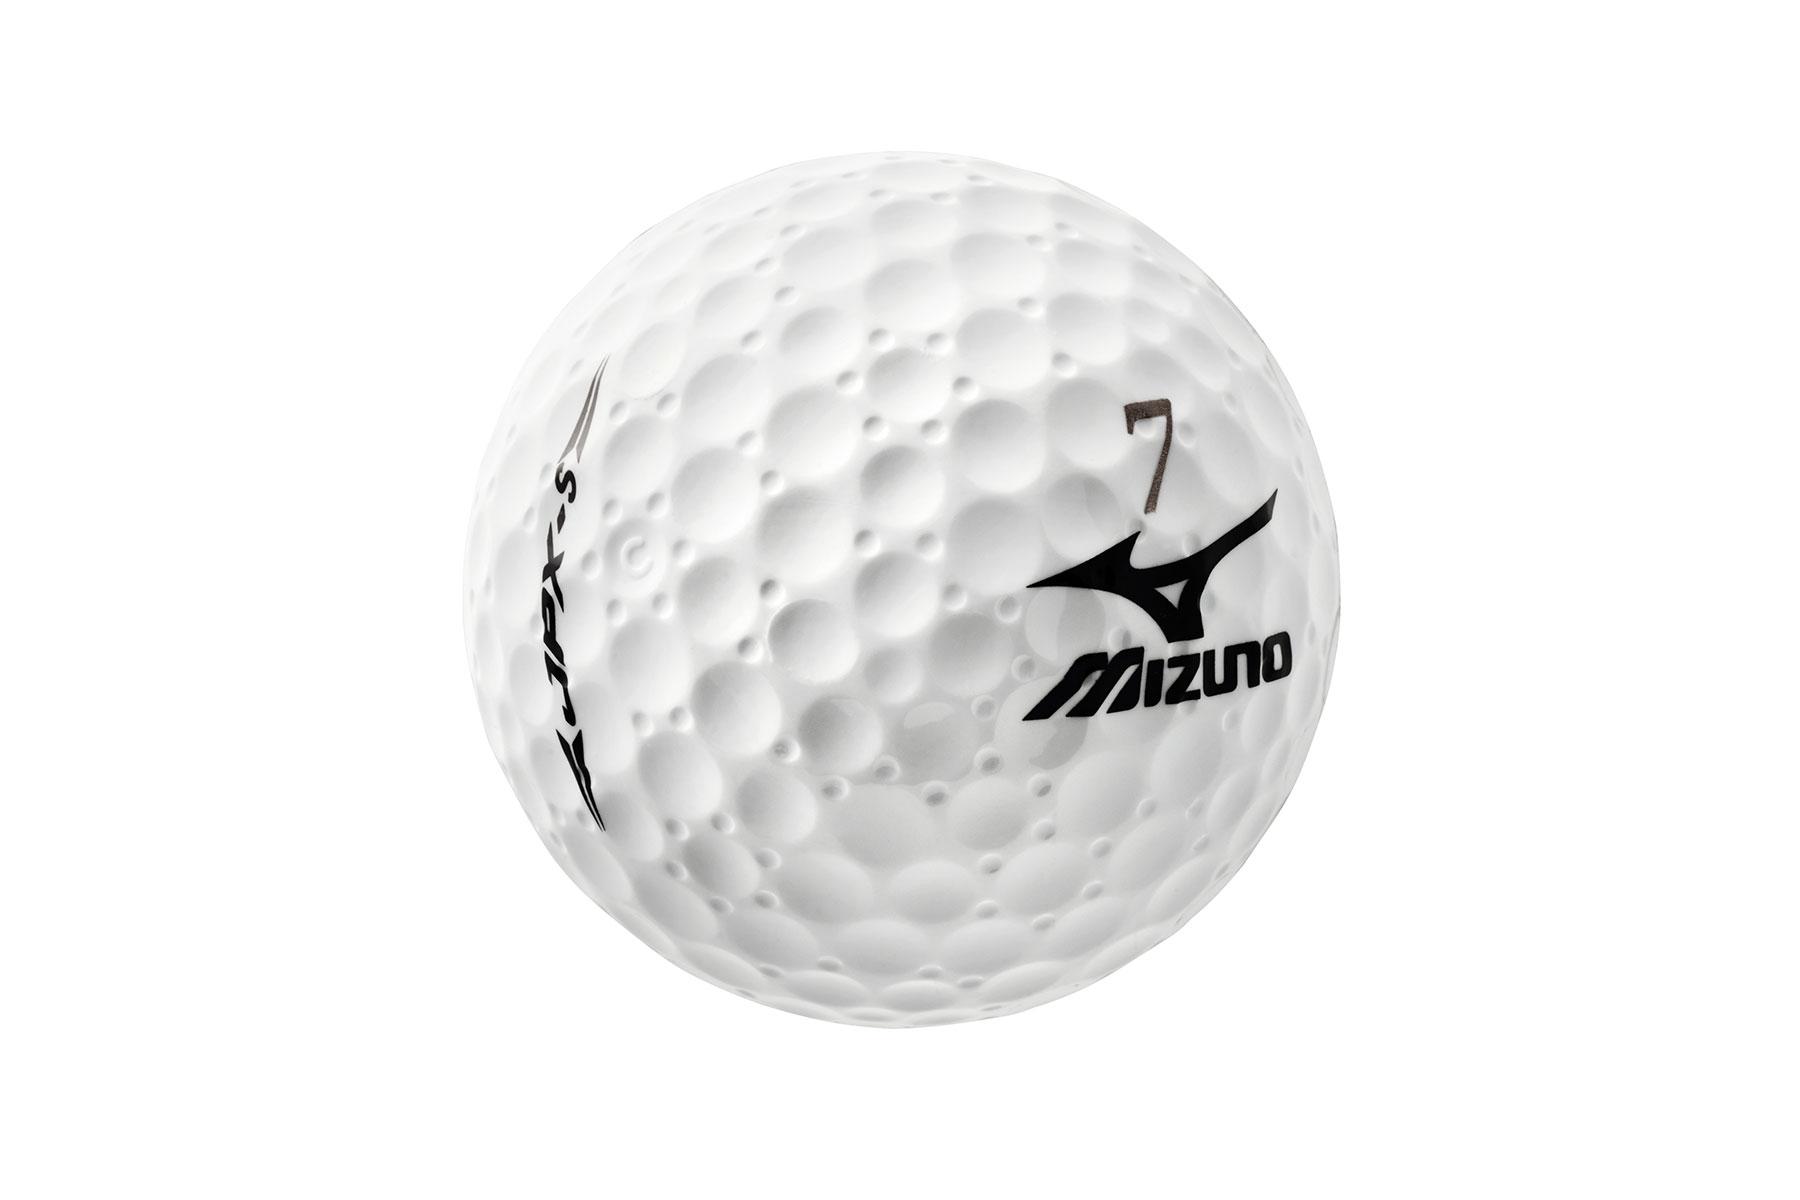 mizuno golf jpx s bonus 15 ball pack from american golf